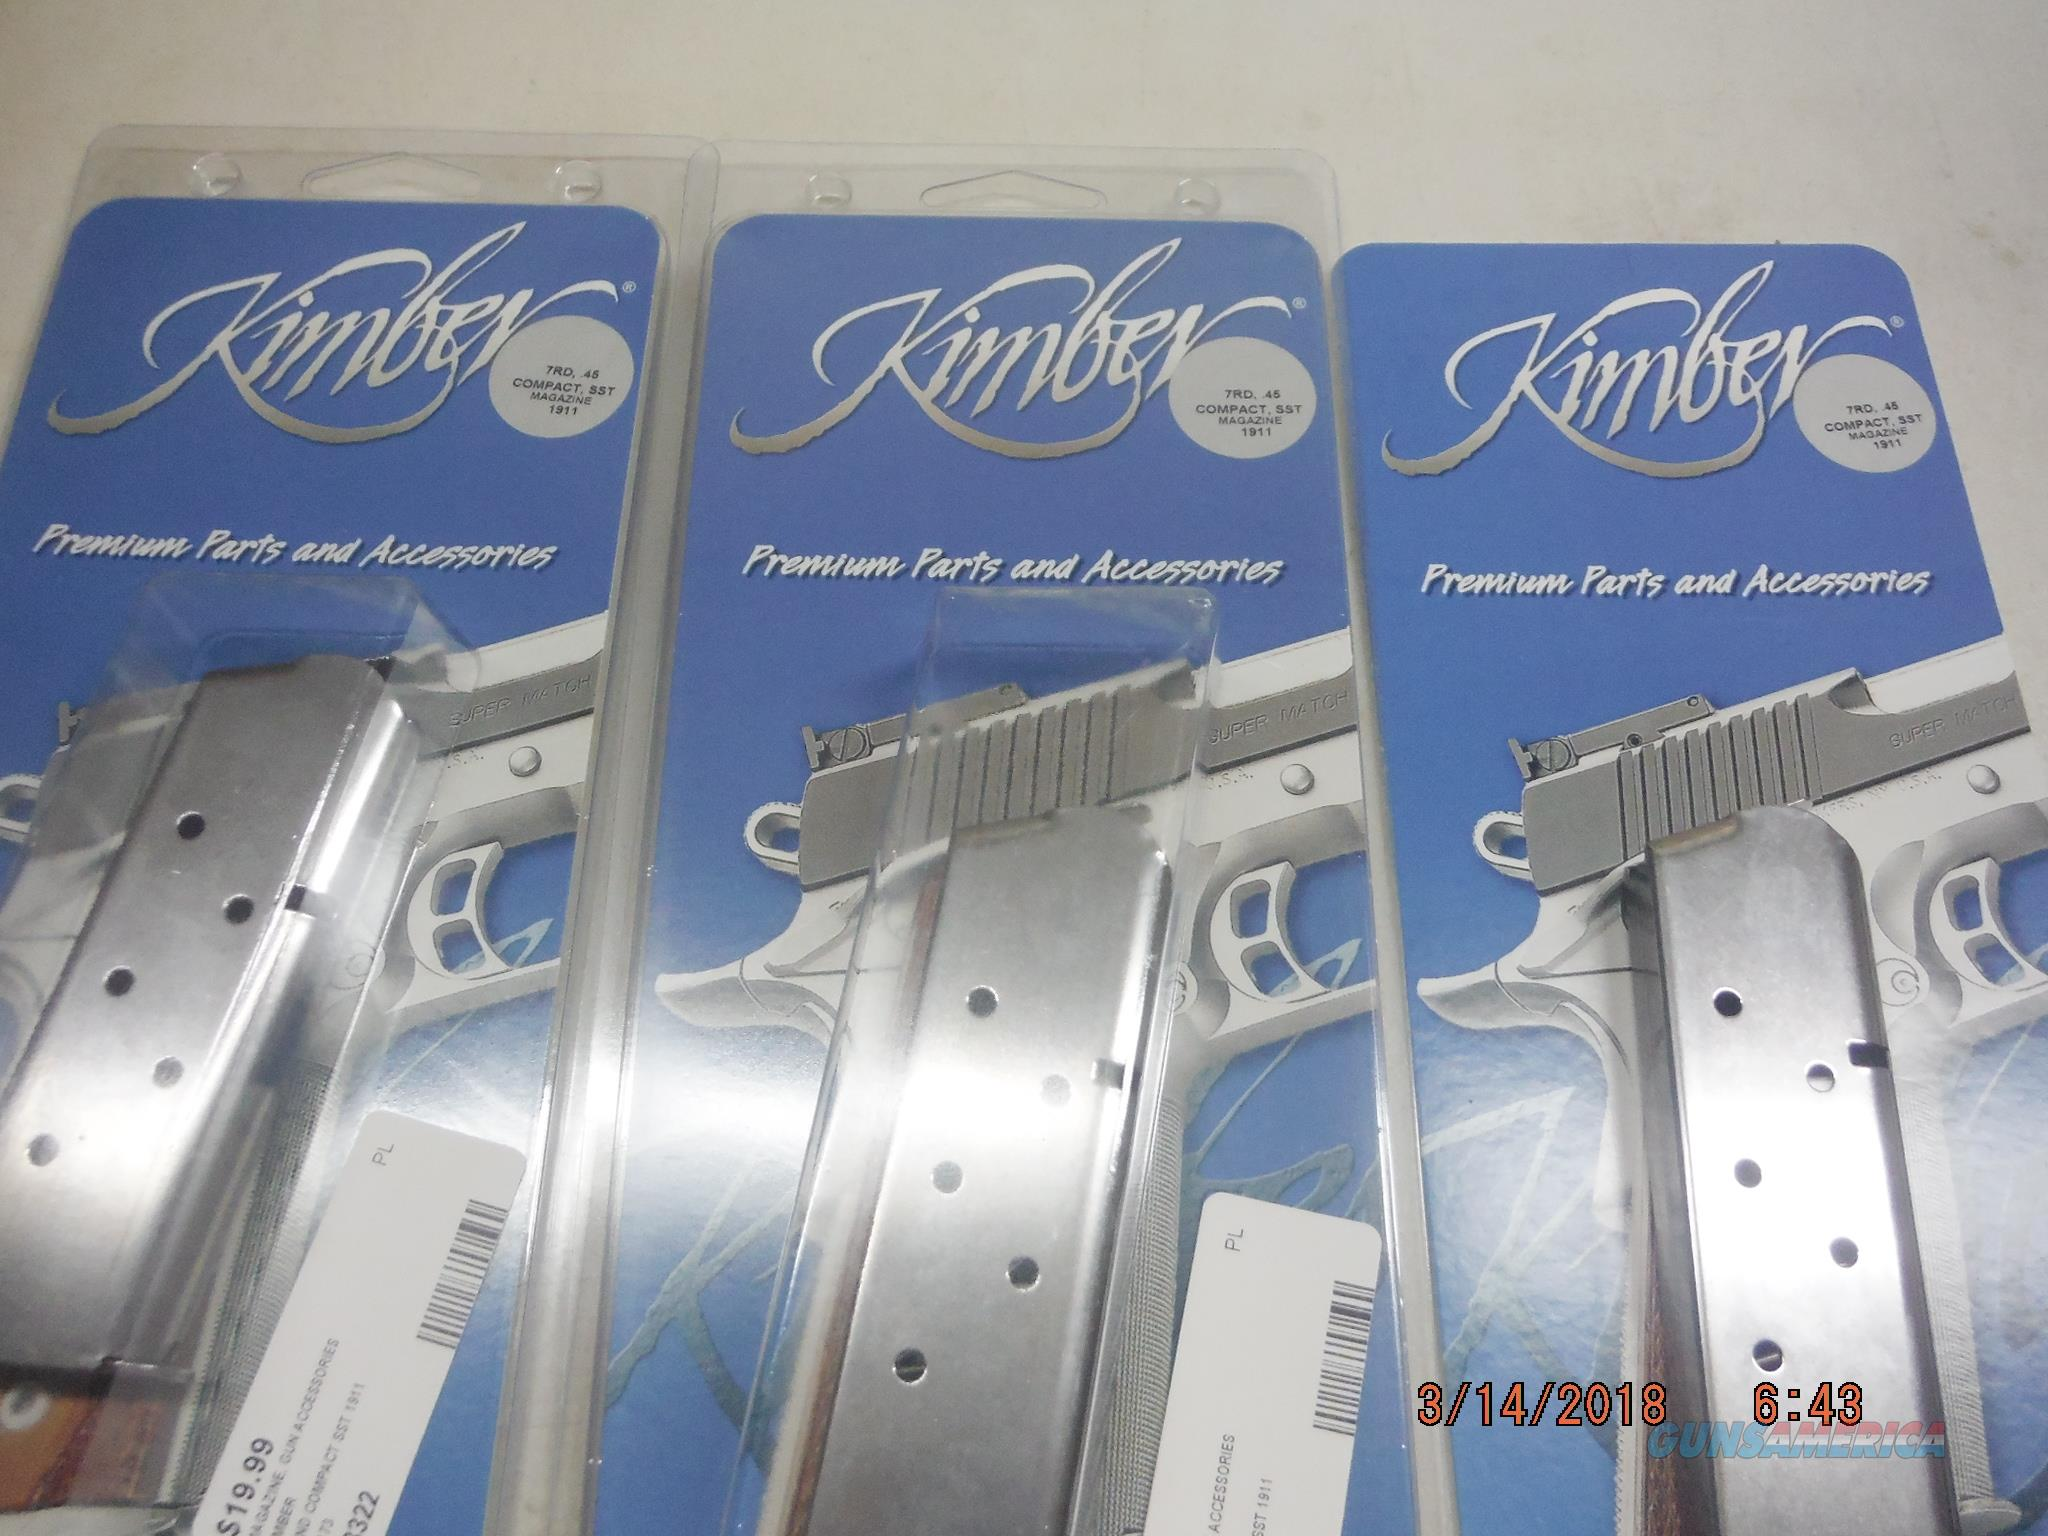 3 KIMBER 1911 Compact Mag 45 ACP 7Rd SS (3-Pk), Factory Kimber  Non-Guns > Magazines & Clips > Pistol Magazines > 1911